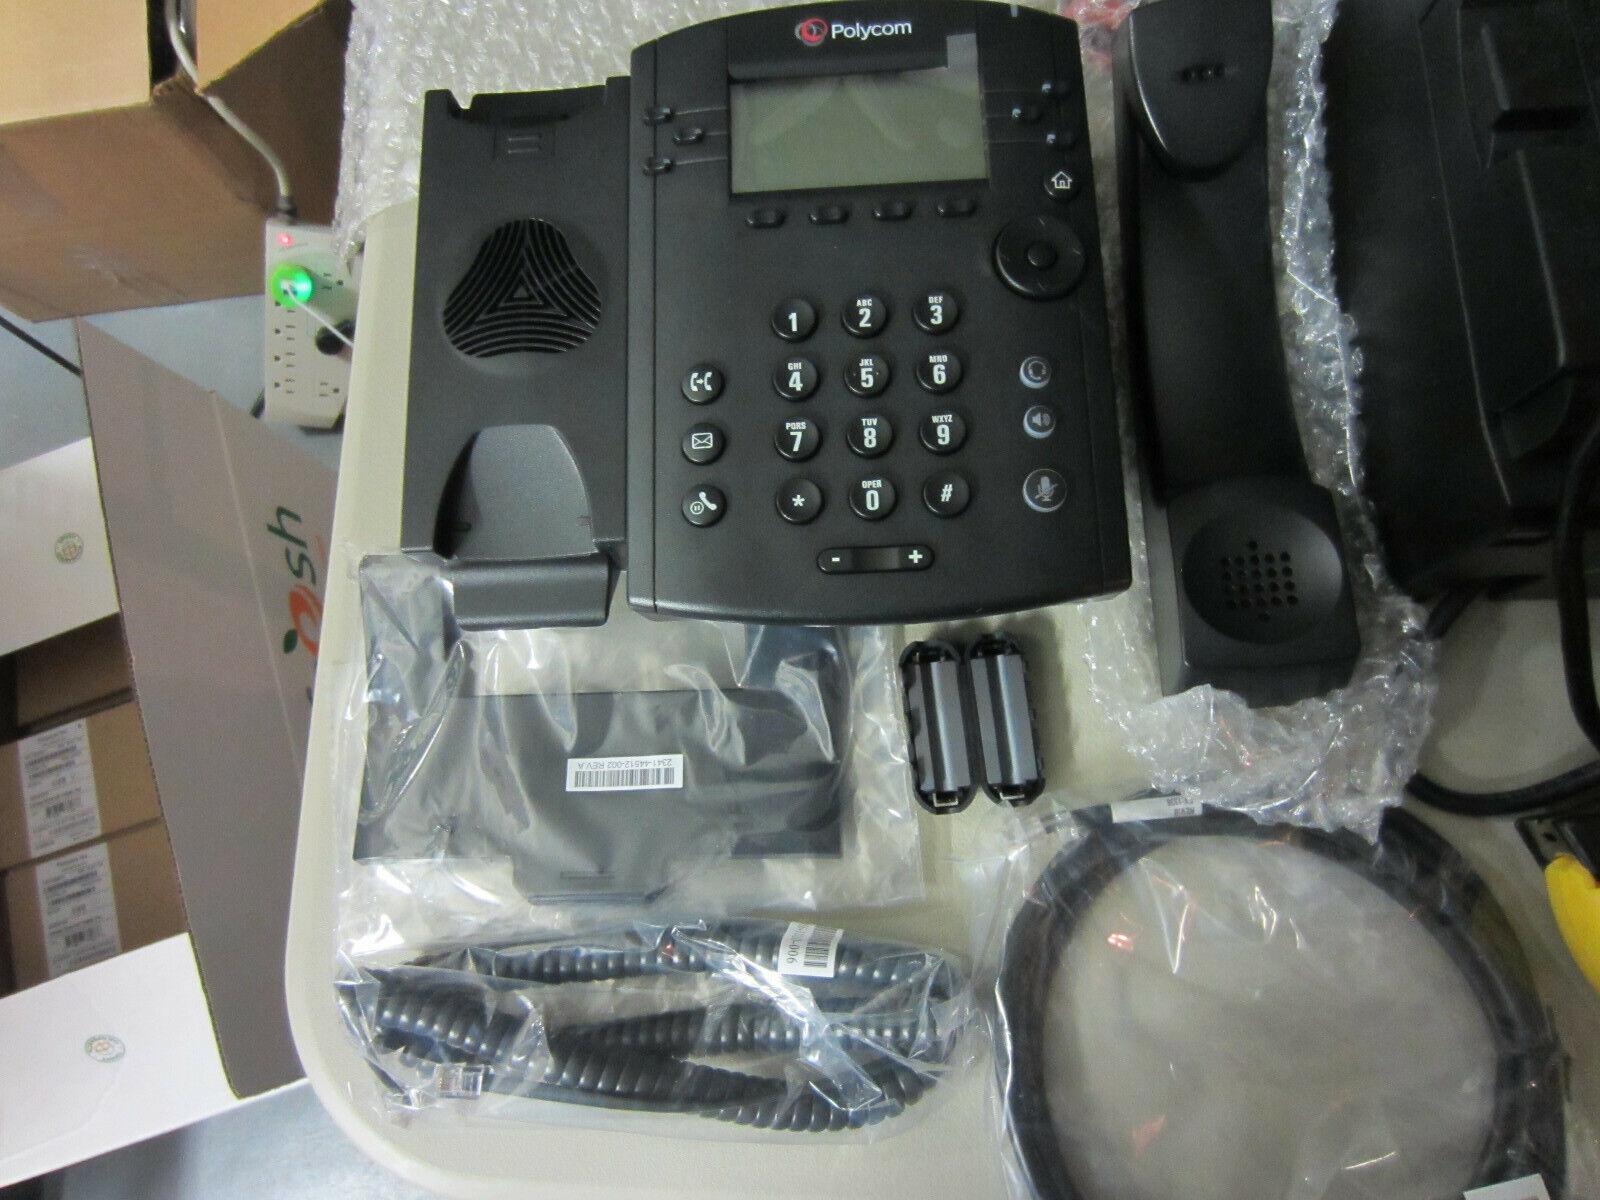 2200-46161-025 Details about  /*New Open Box* Corvisa Polycom VVX310 IP Business Office Phone